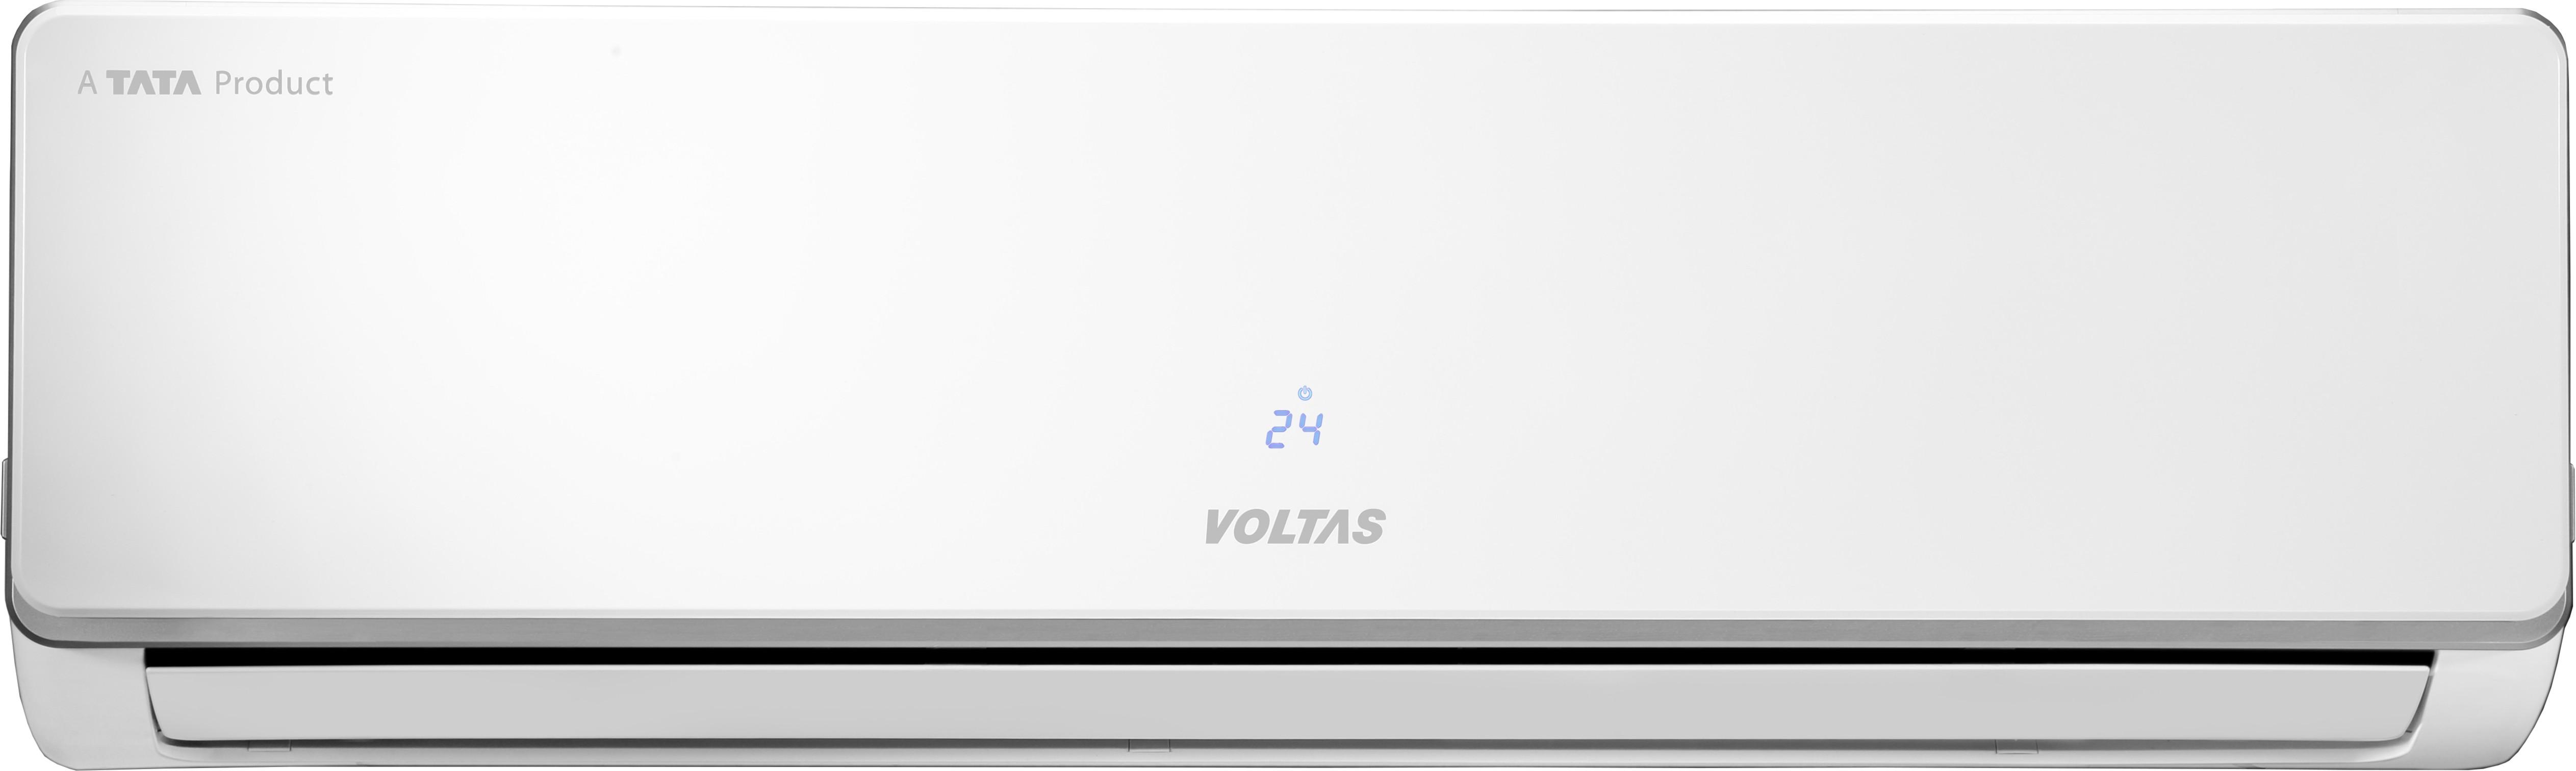 Voltas 181 SZS 1.5 Ton 1 Star BEE Rating 2018 Split AC Image